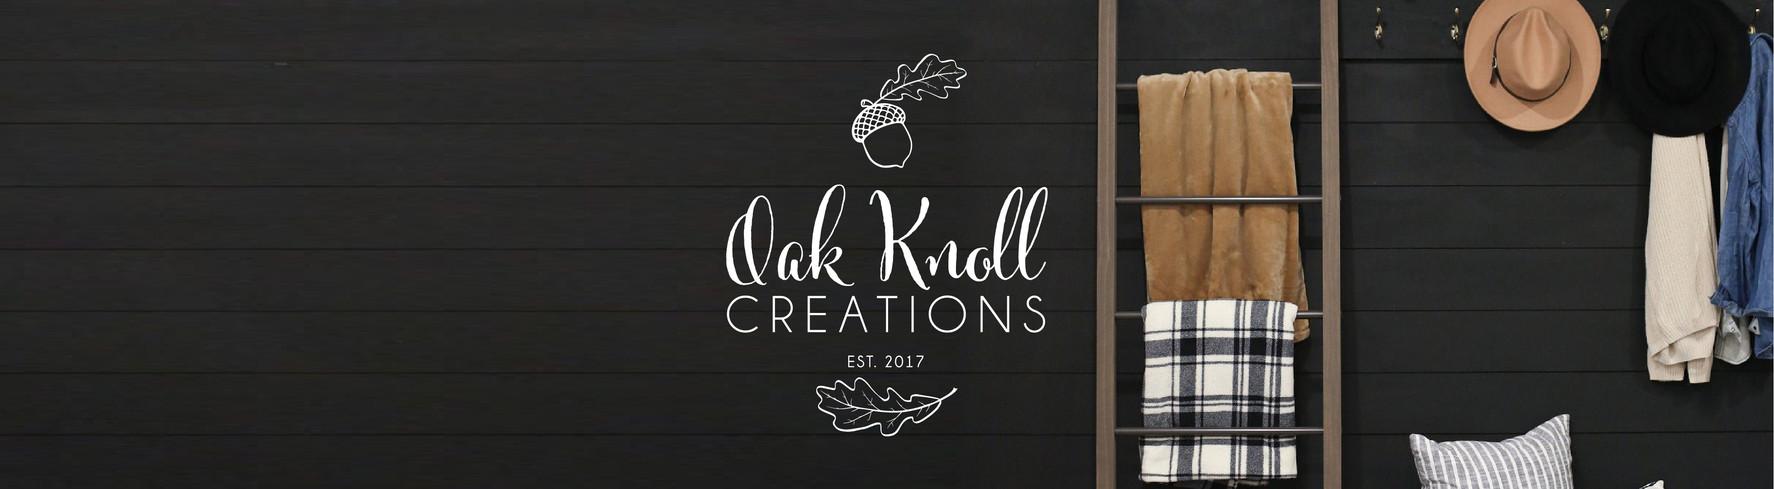 oak-knoll-creations-watermark.jpg